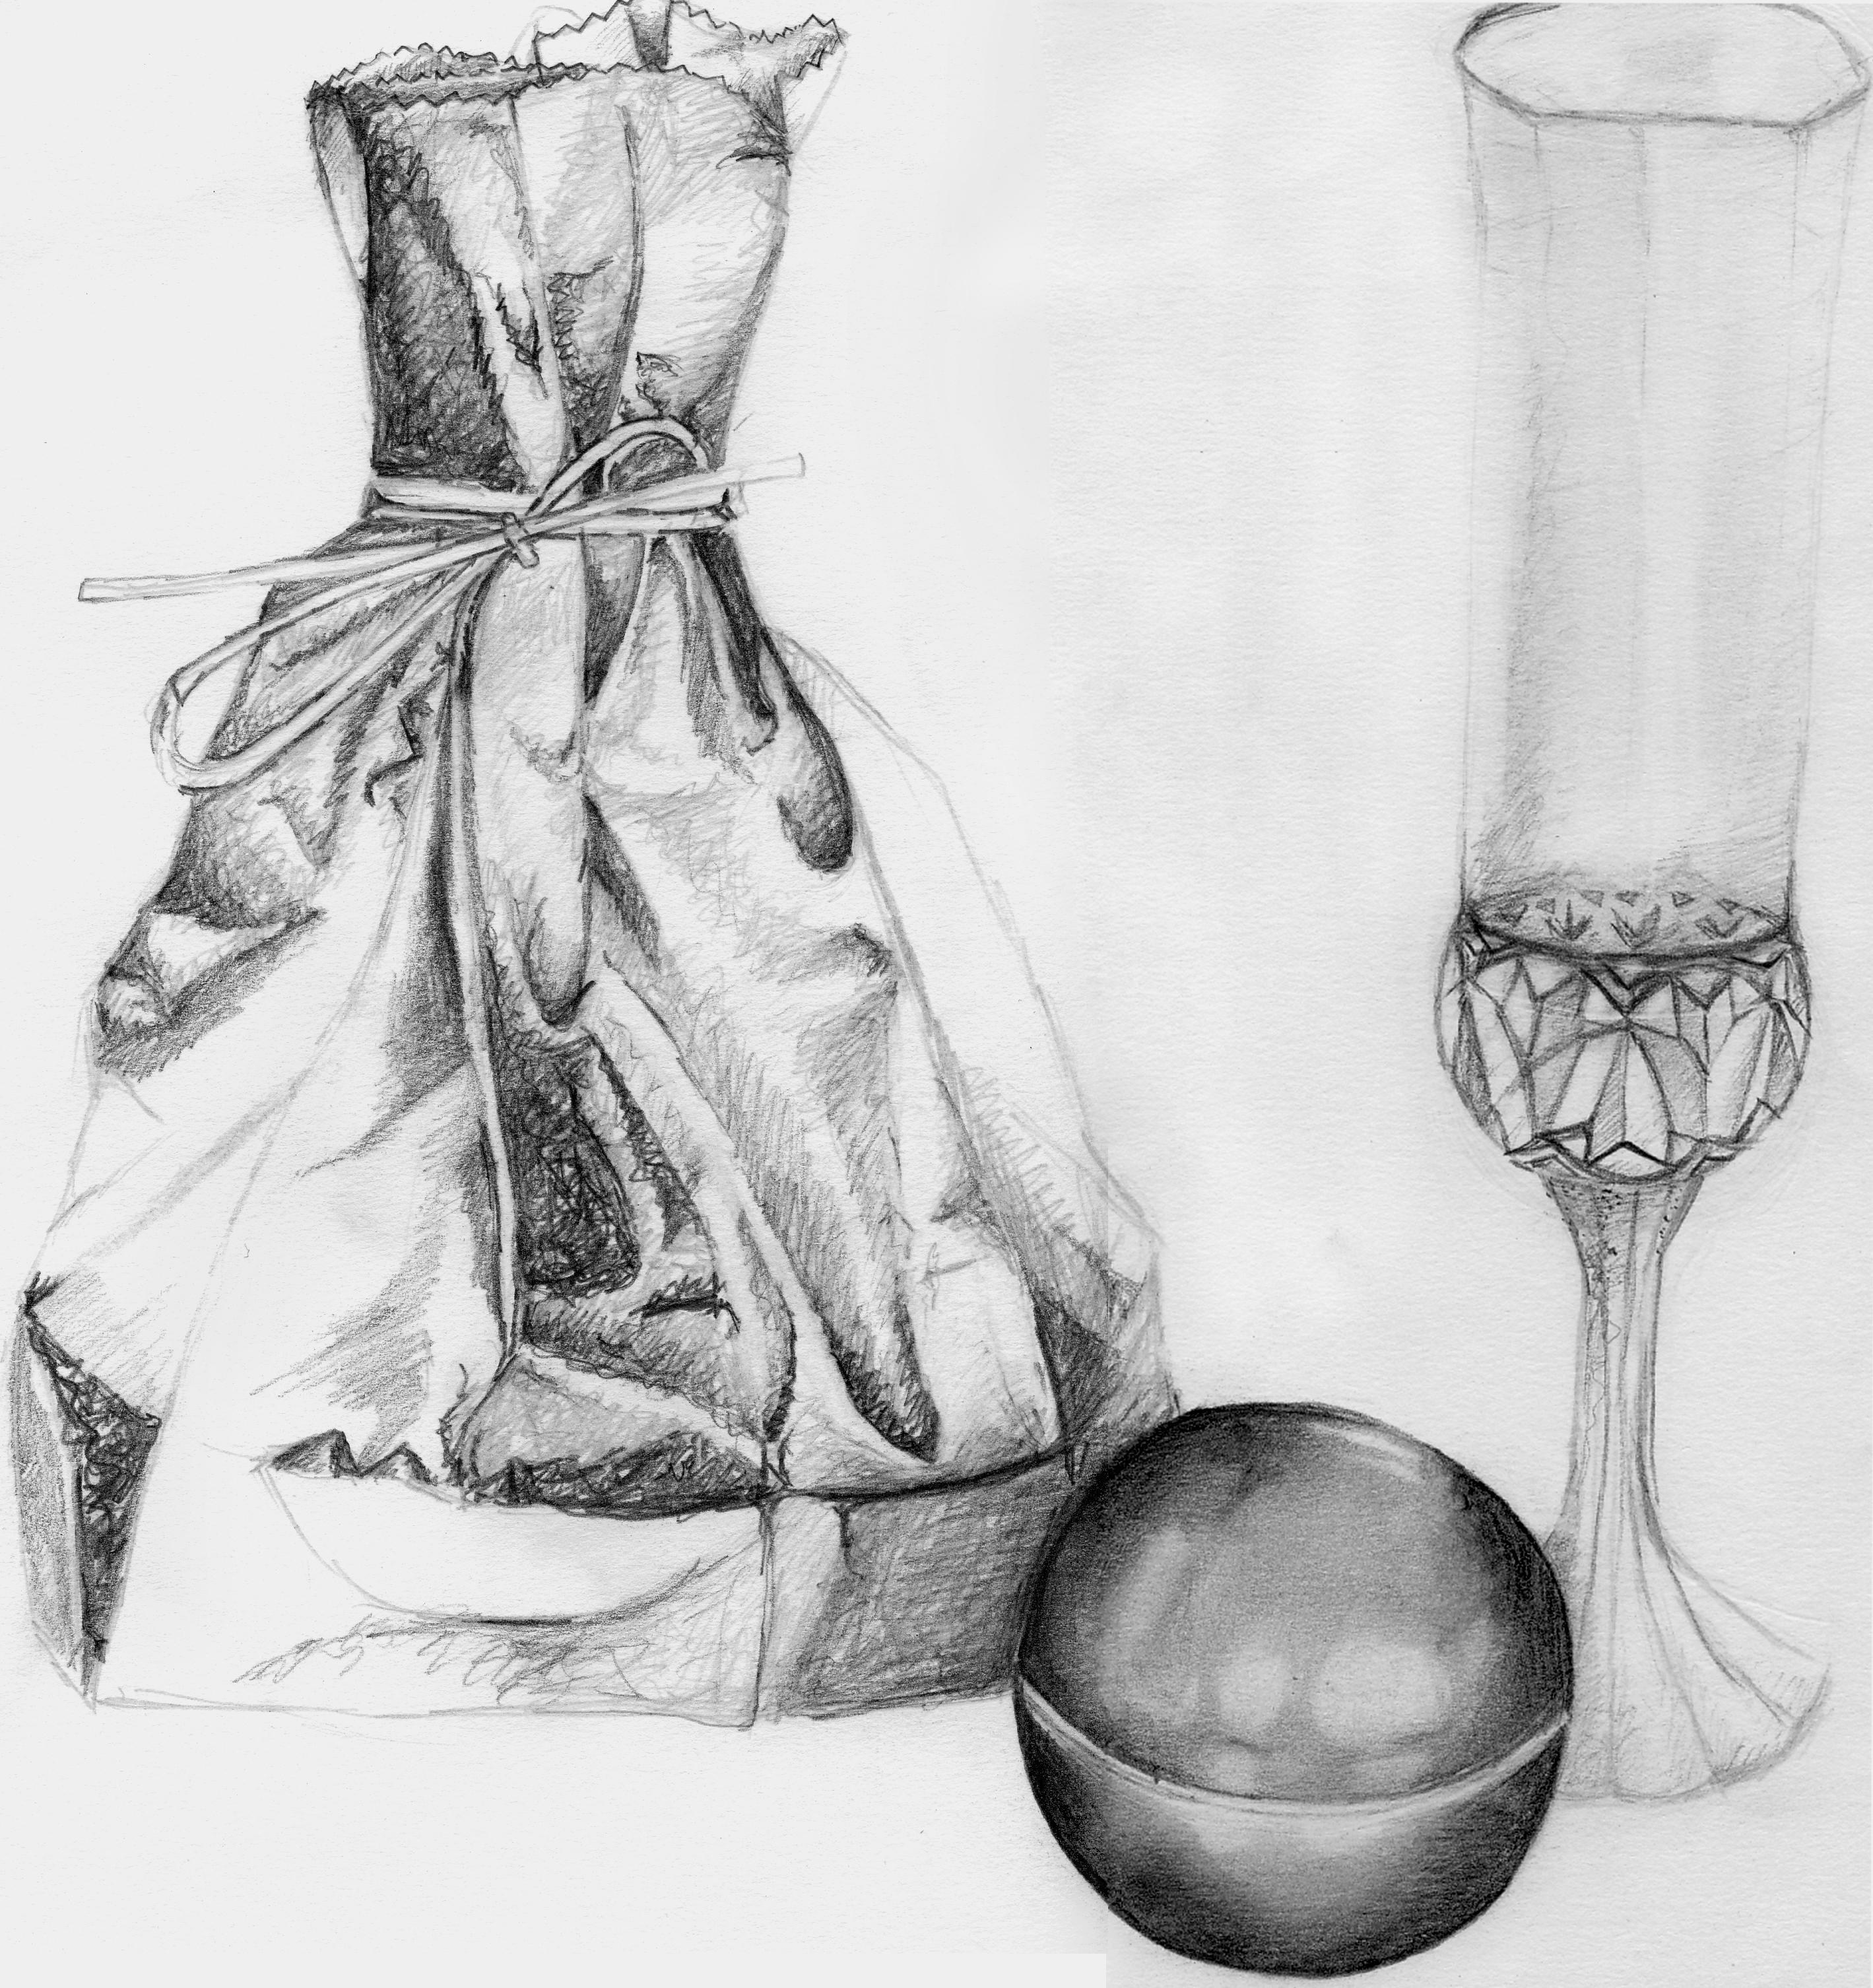 Glass Metal Soft Drawing By Jaan Jaak On Deviantart